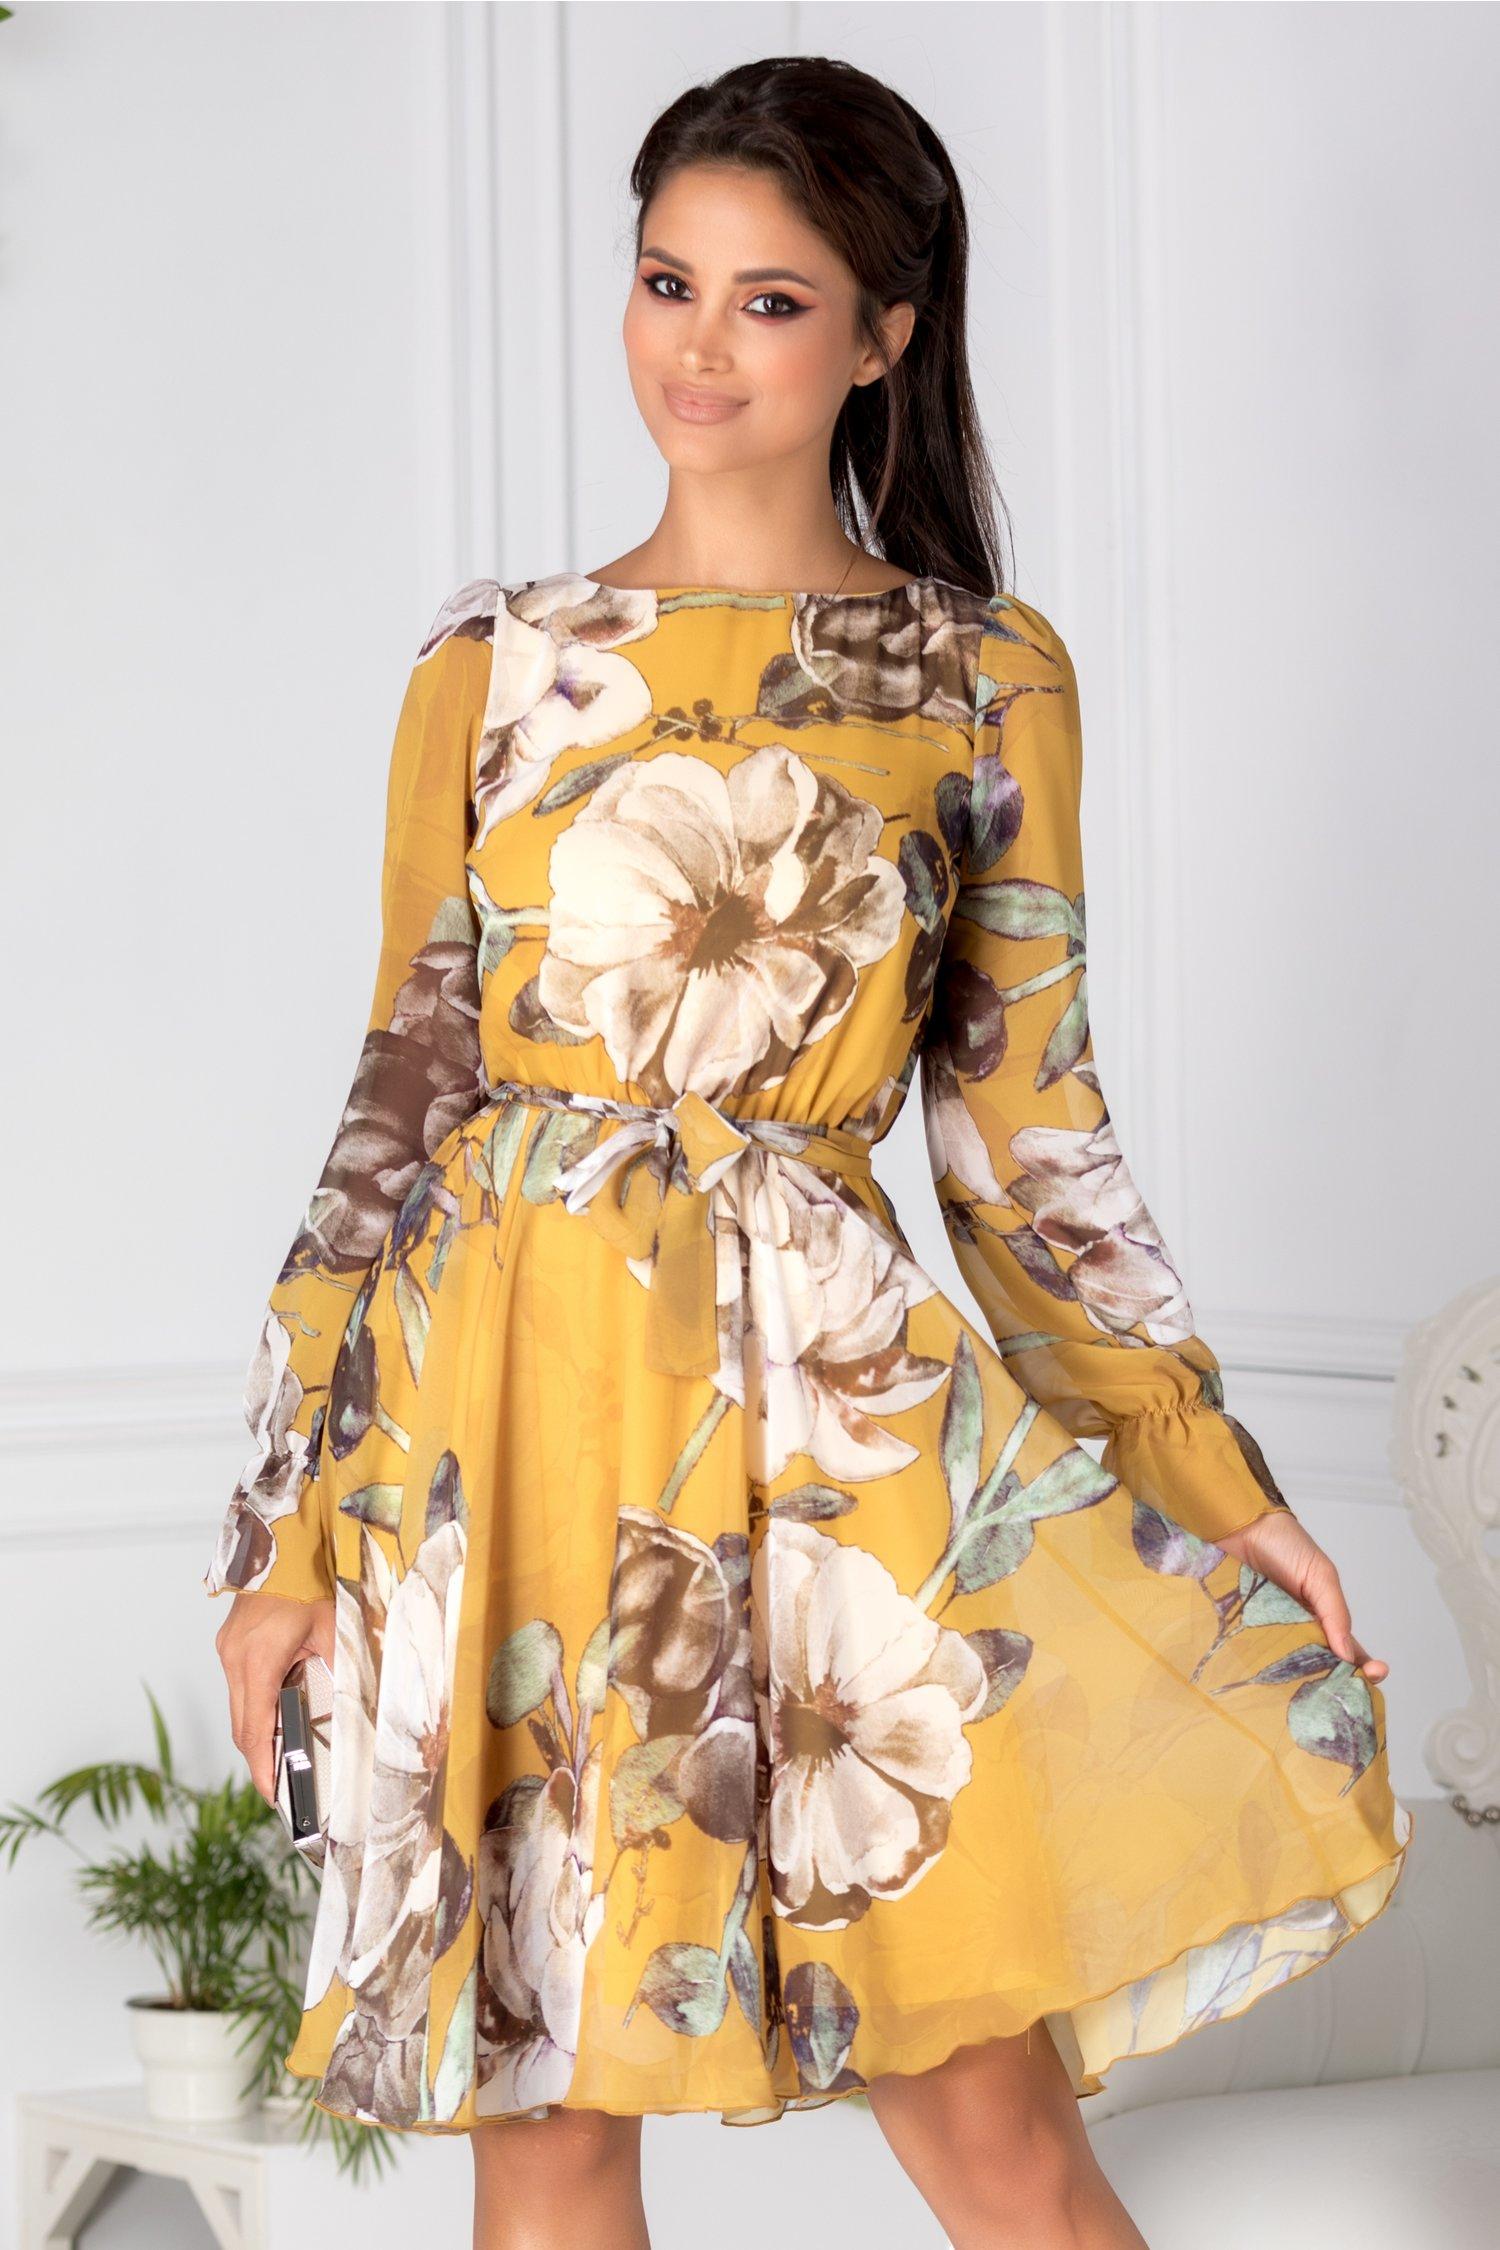 Rochie Fofy galben mustar vaporoasa din voal cu flori mari